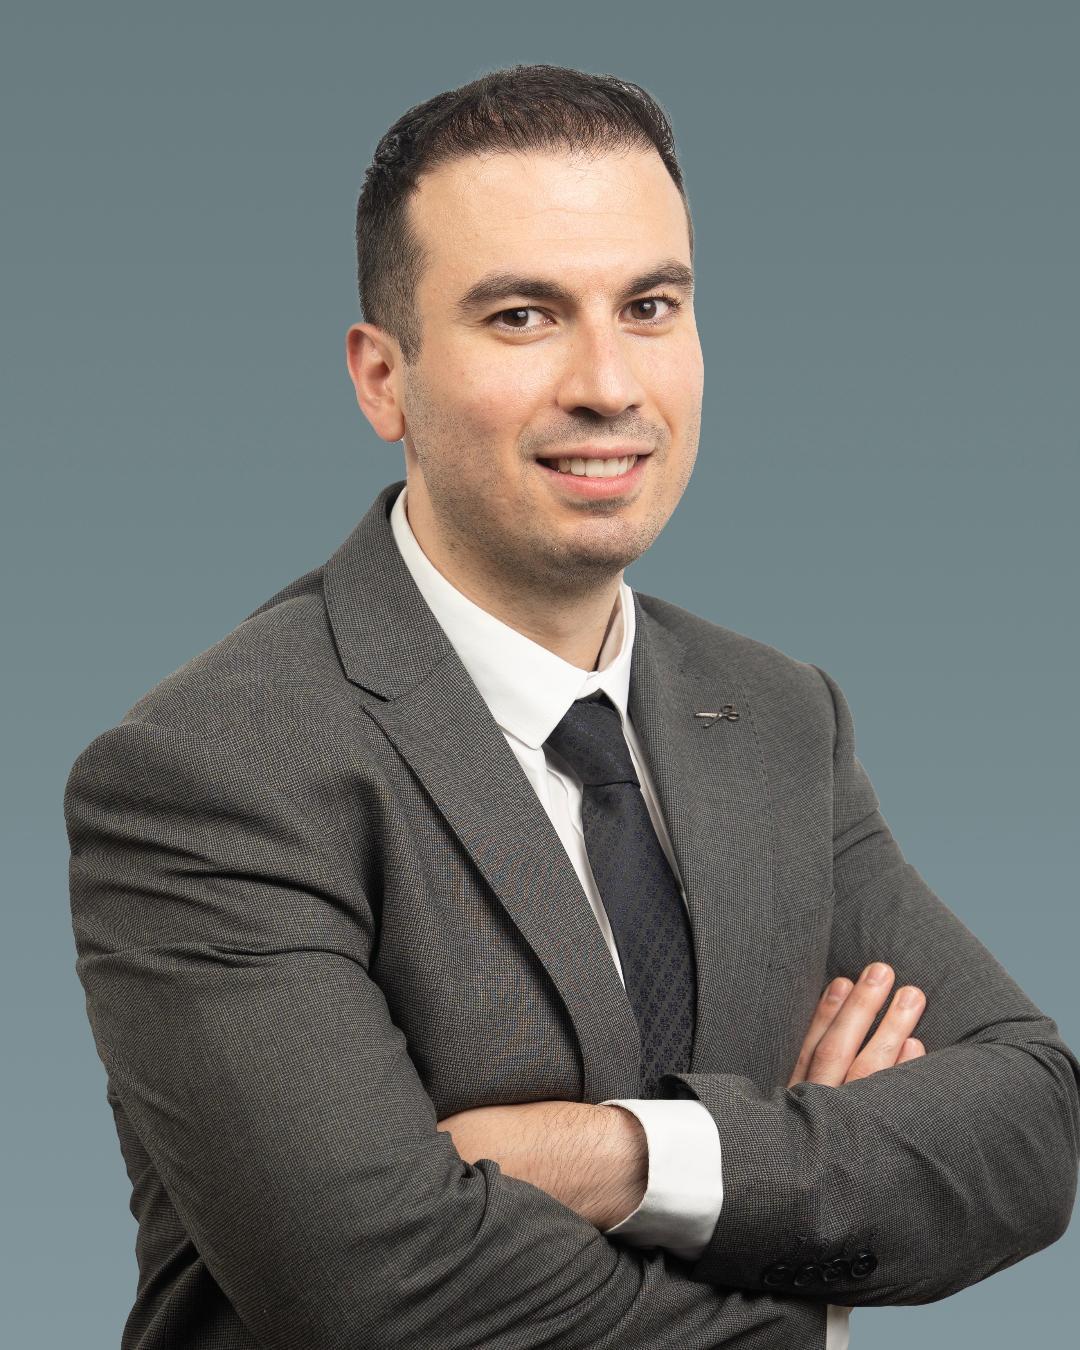 Dr Homoud